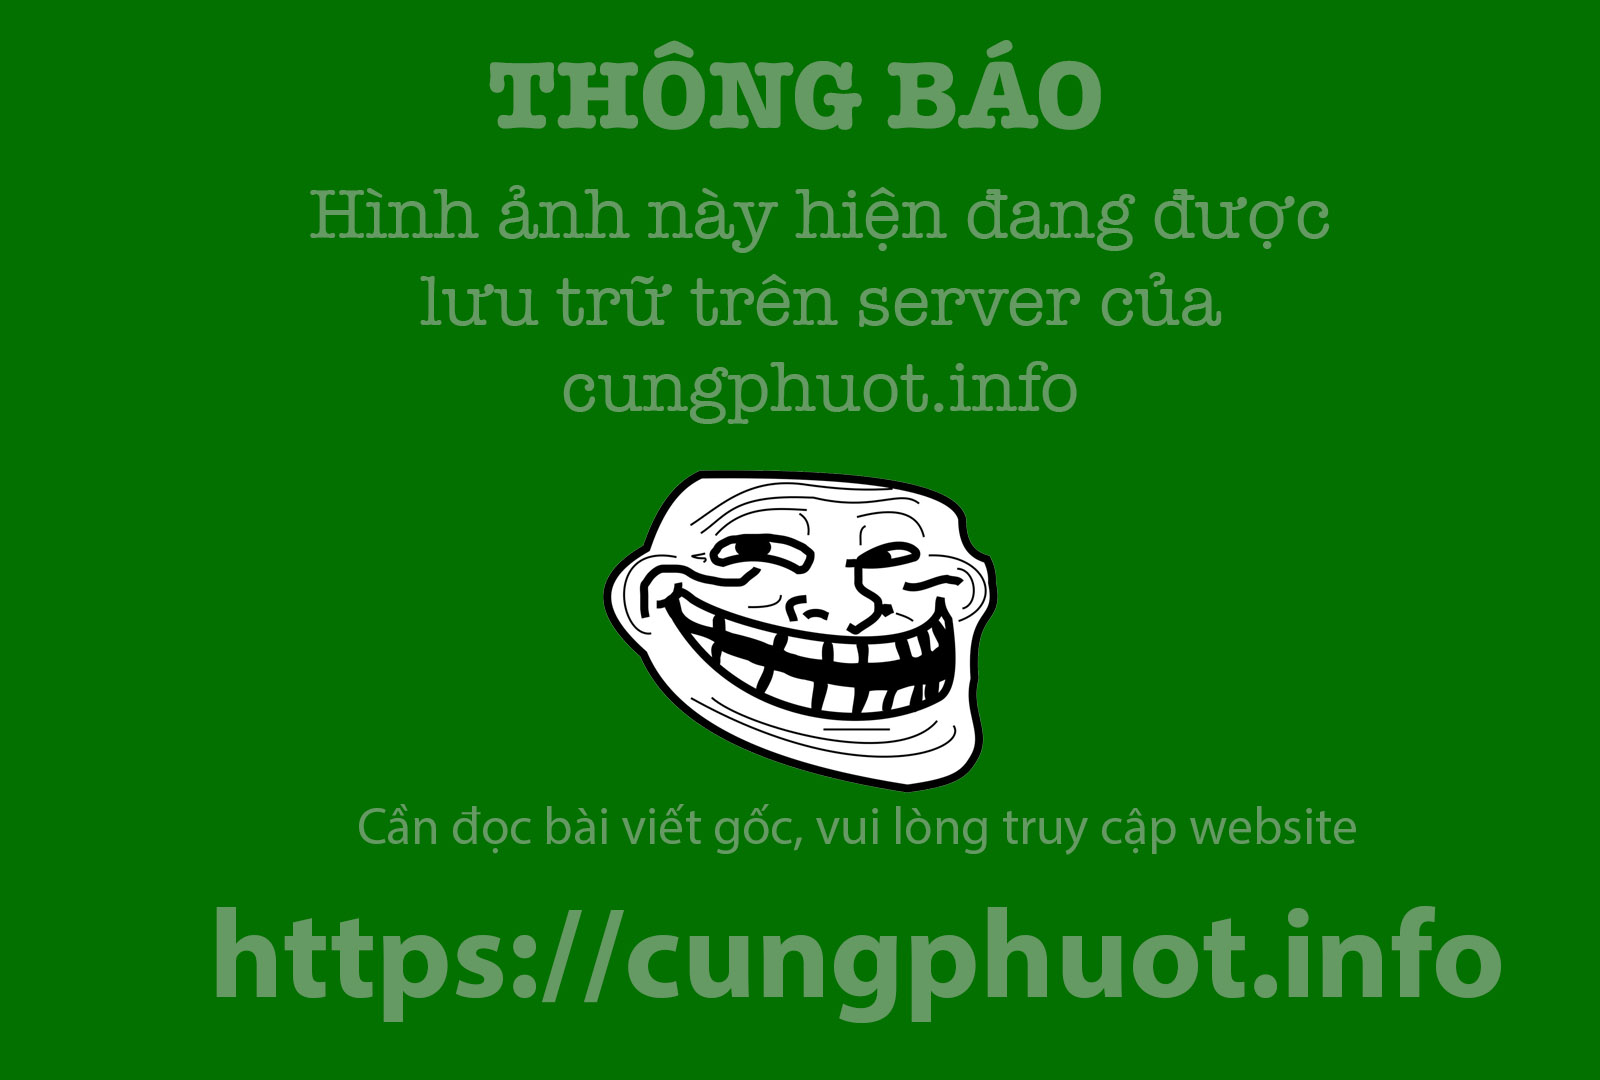 Ảnh:@myl_truong